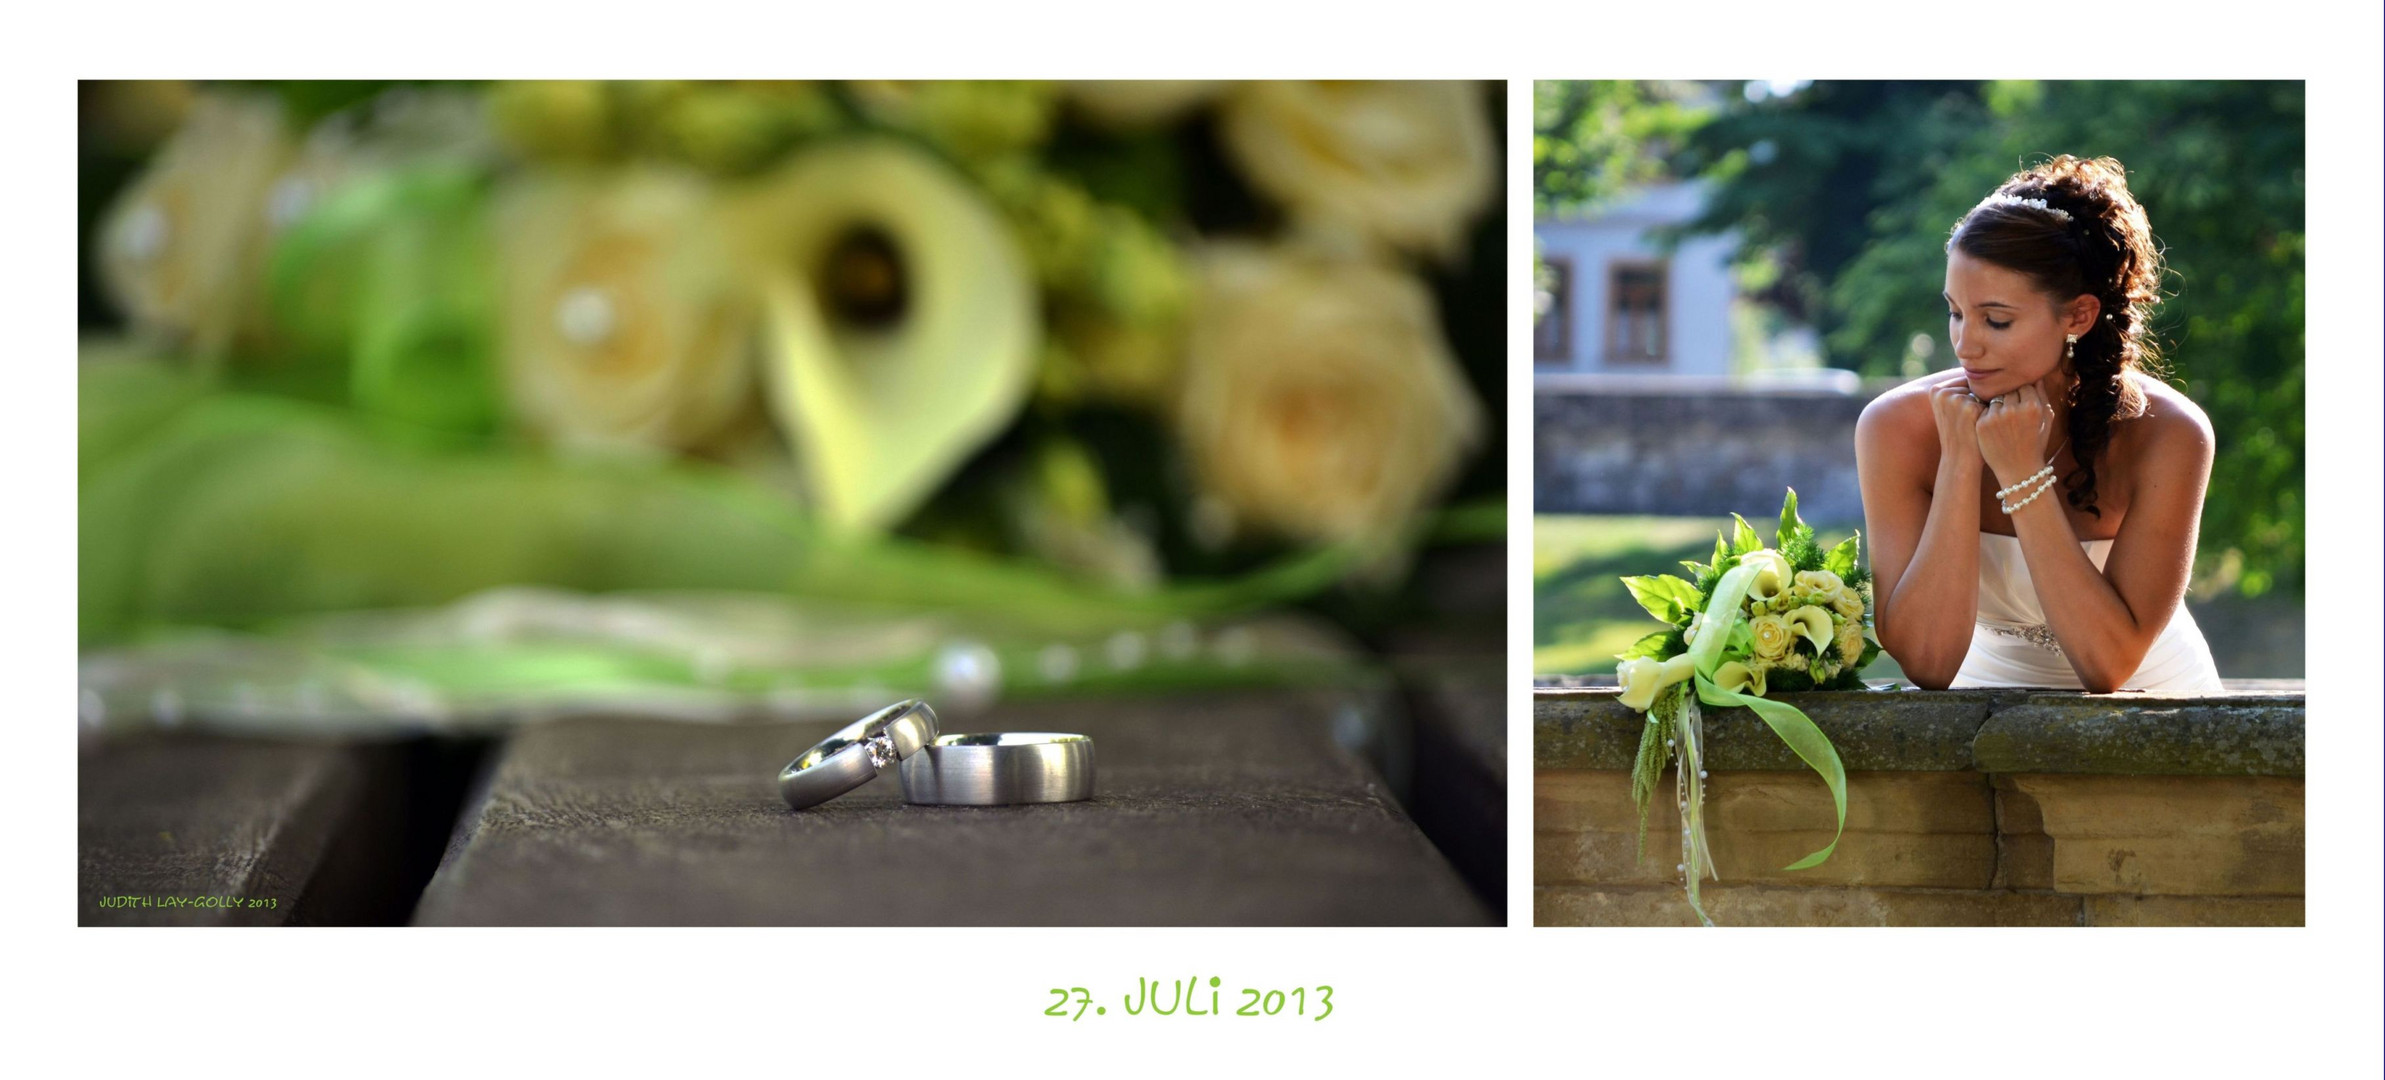 27. Juli 2013